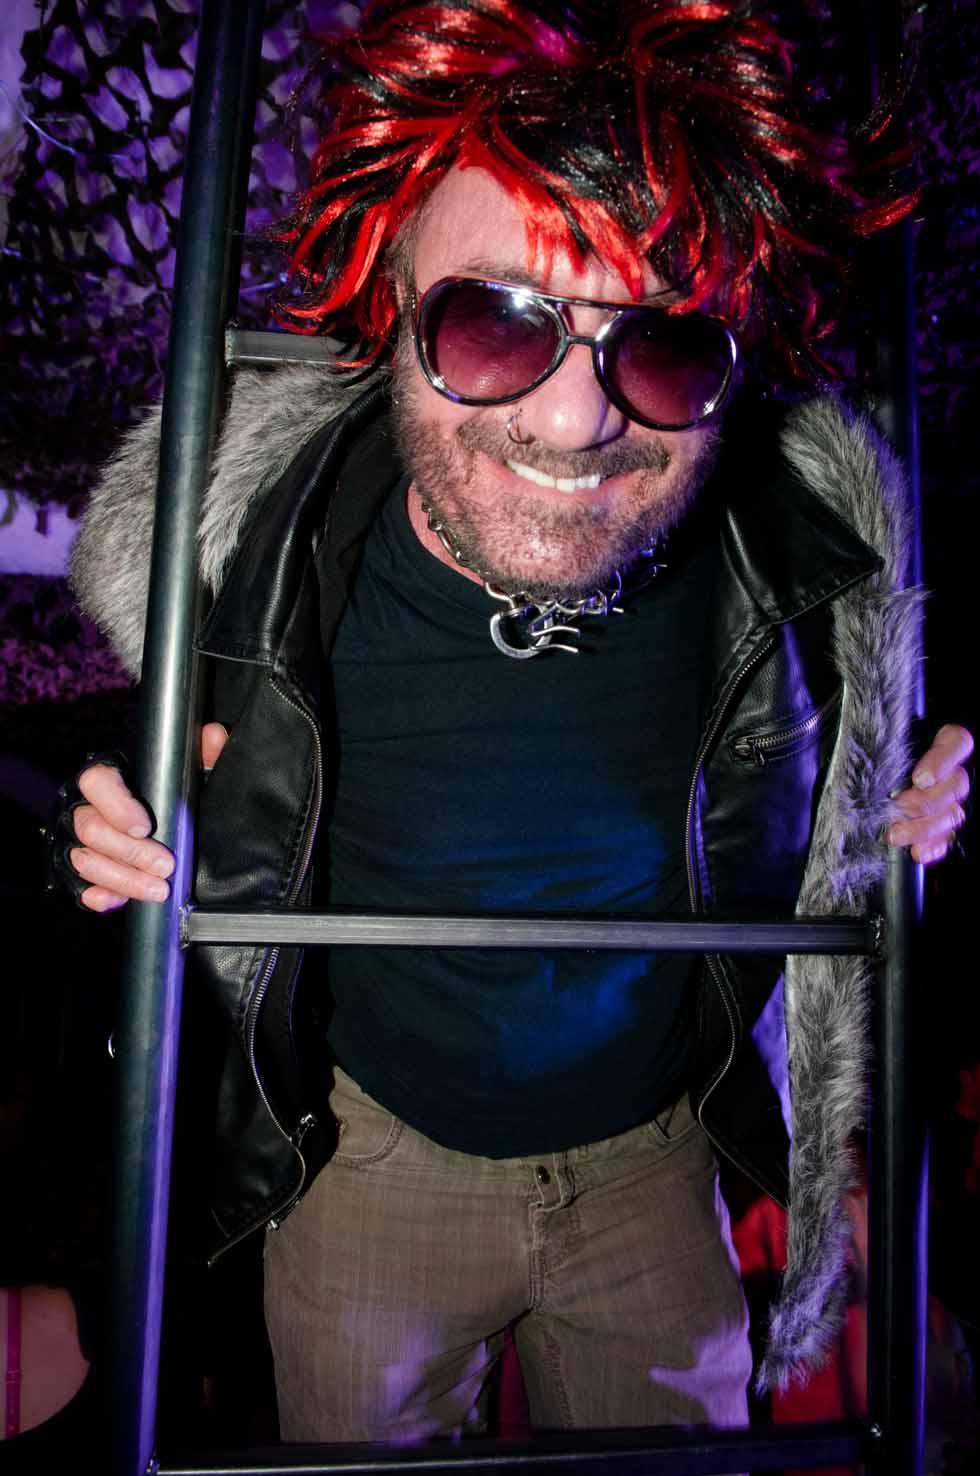 zum-schneider-nyc-2012-karneval-apocalyptika-3899.jpg